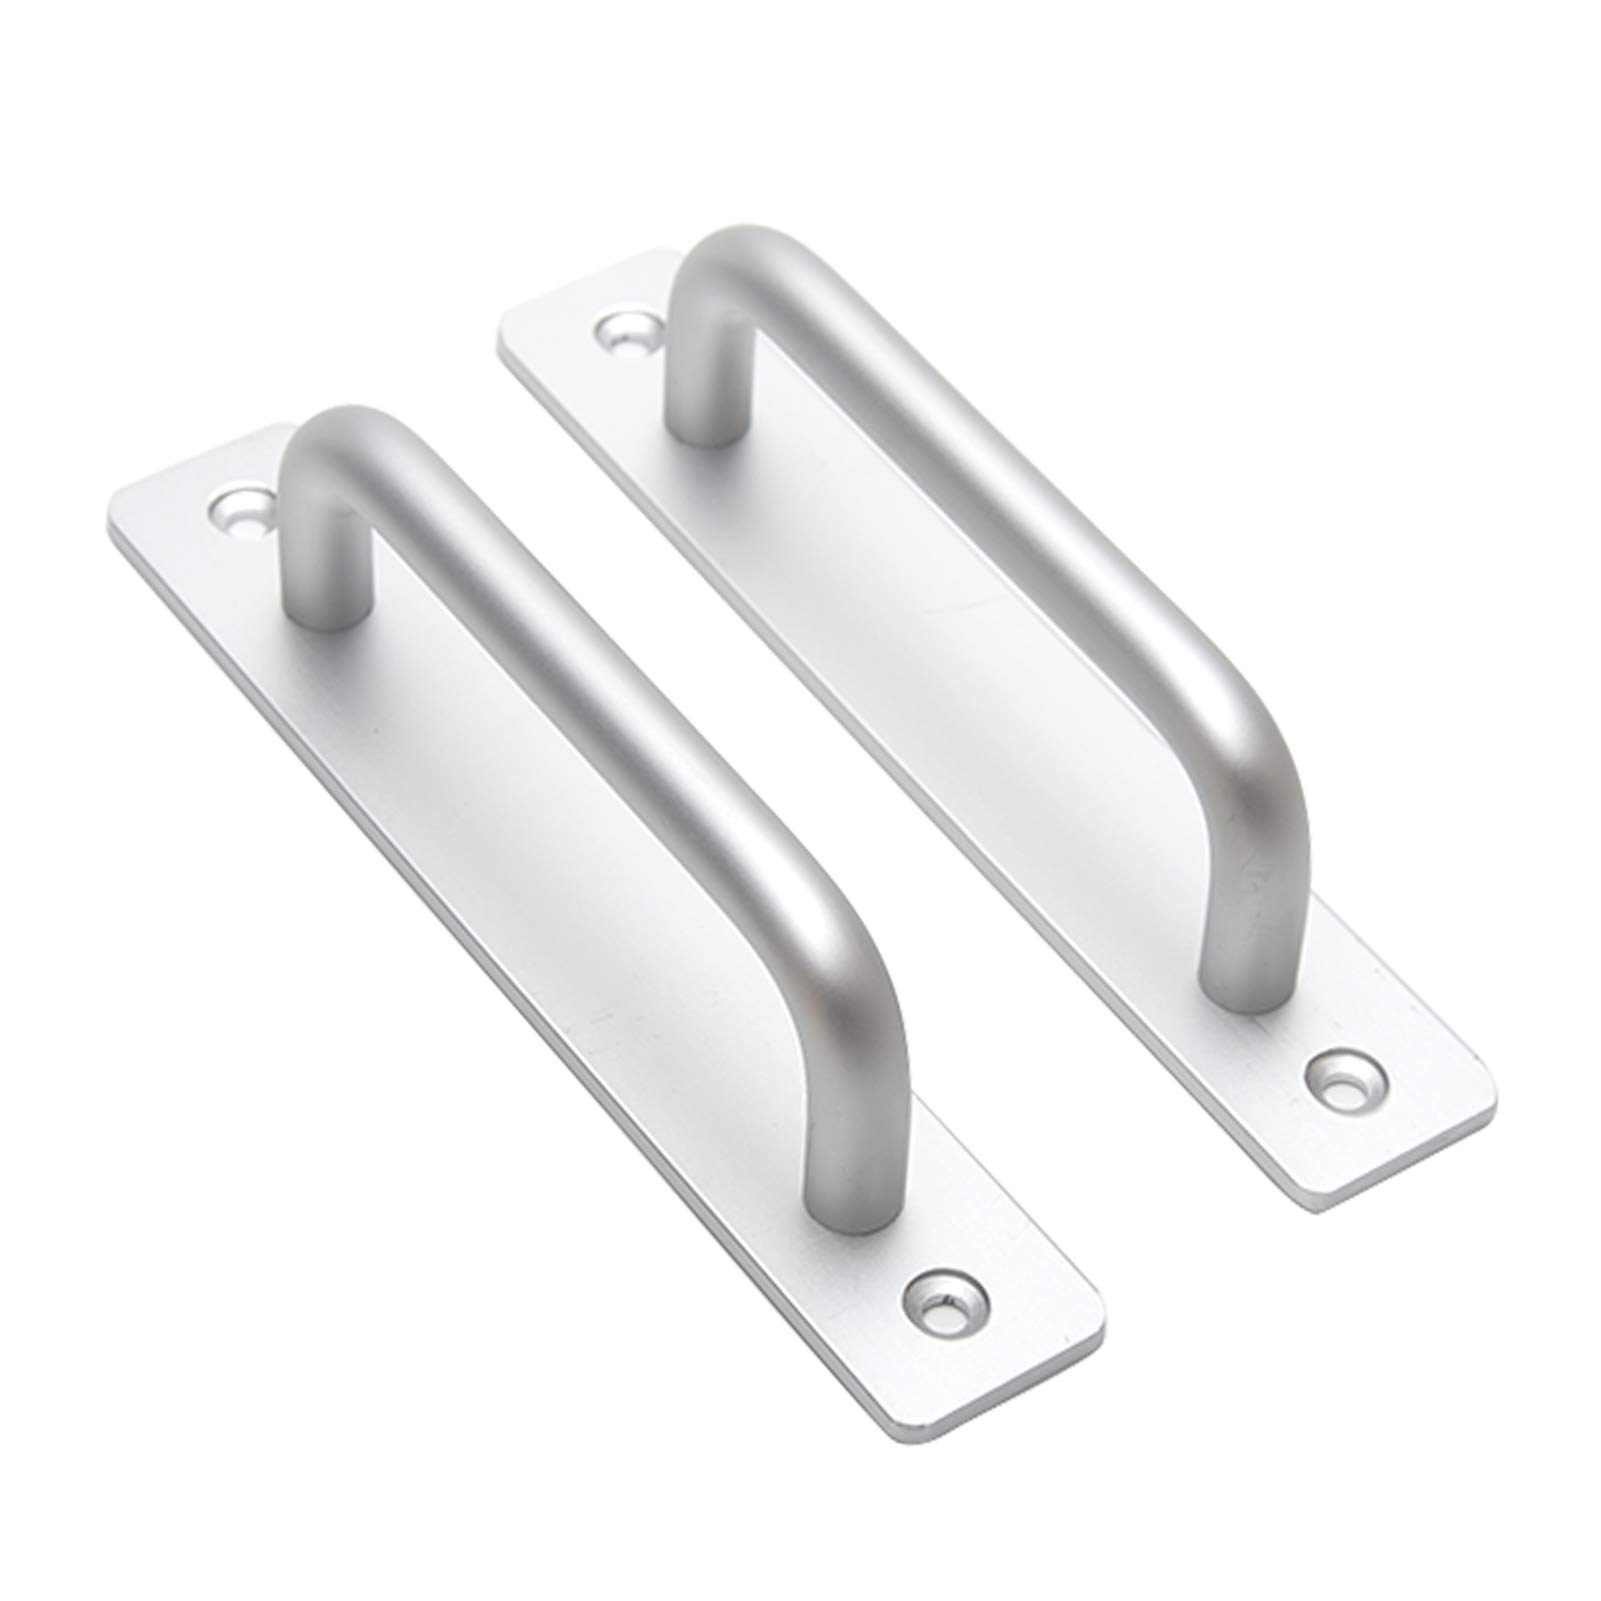 Black Aluminum Alloy Handle Pull Gate Shed Cabinet Handle for Sliding Door Z